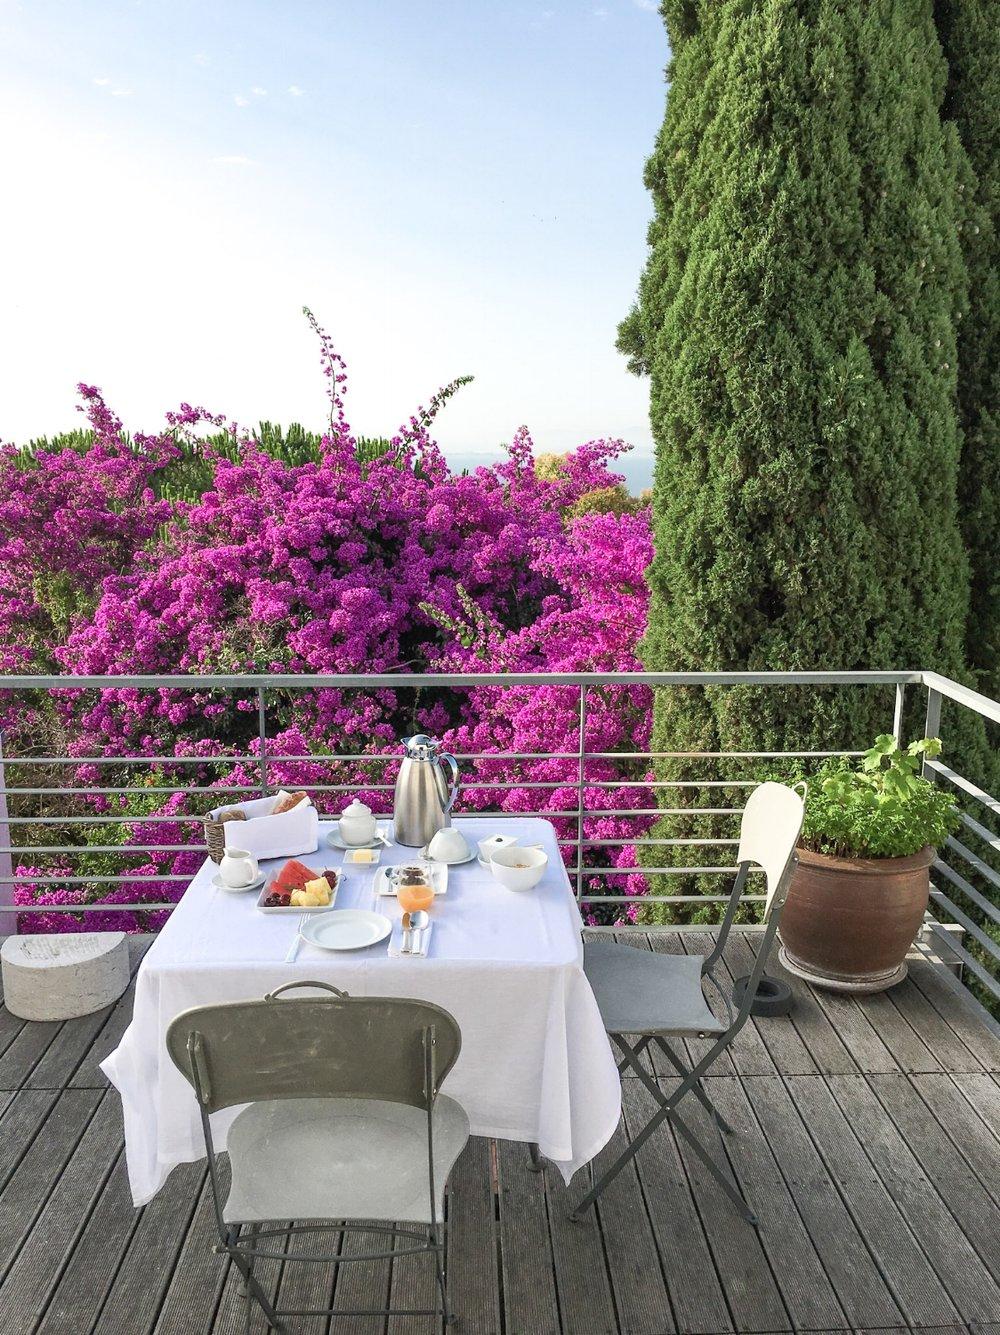 curio.trips.portugal.lisbon.palacio.belmonte.room.balcony.jpg